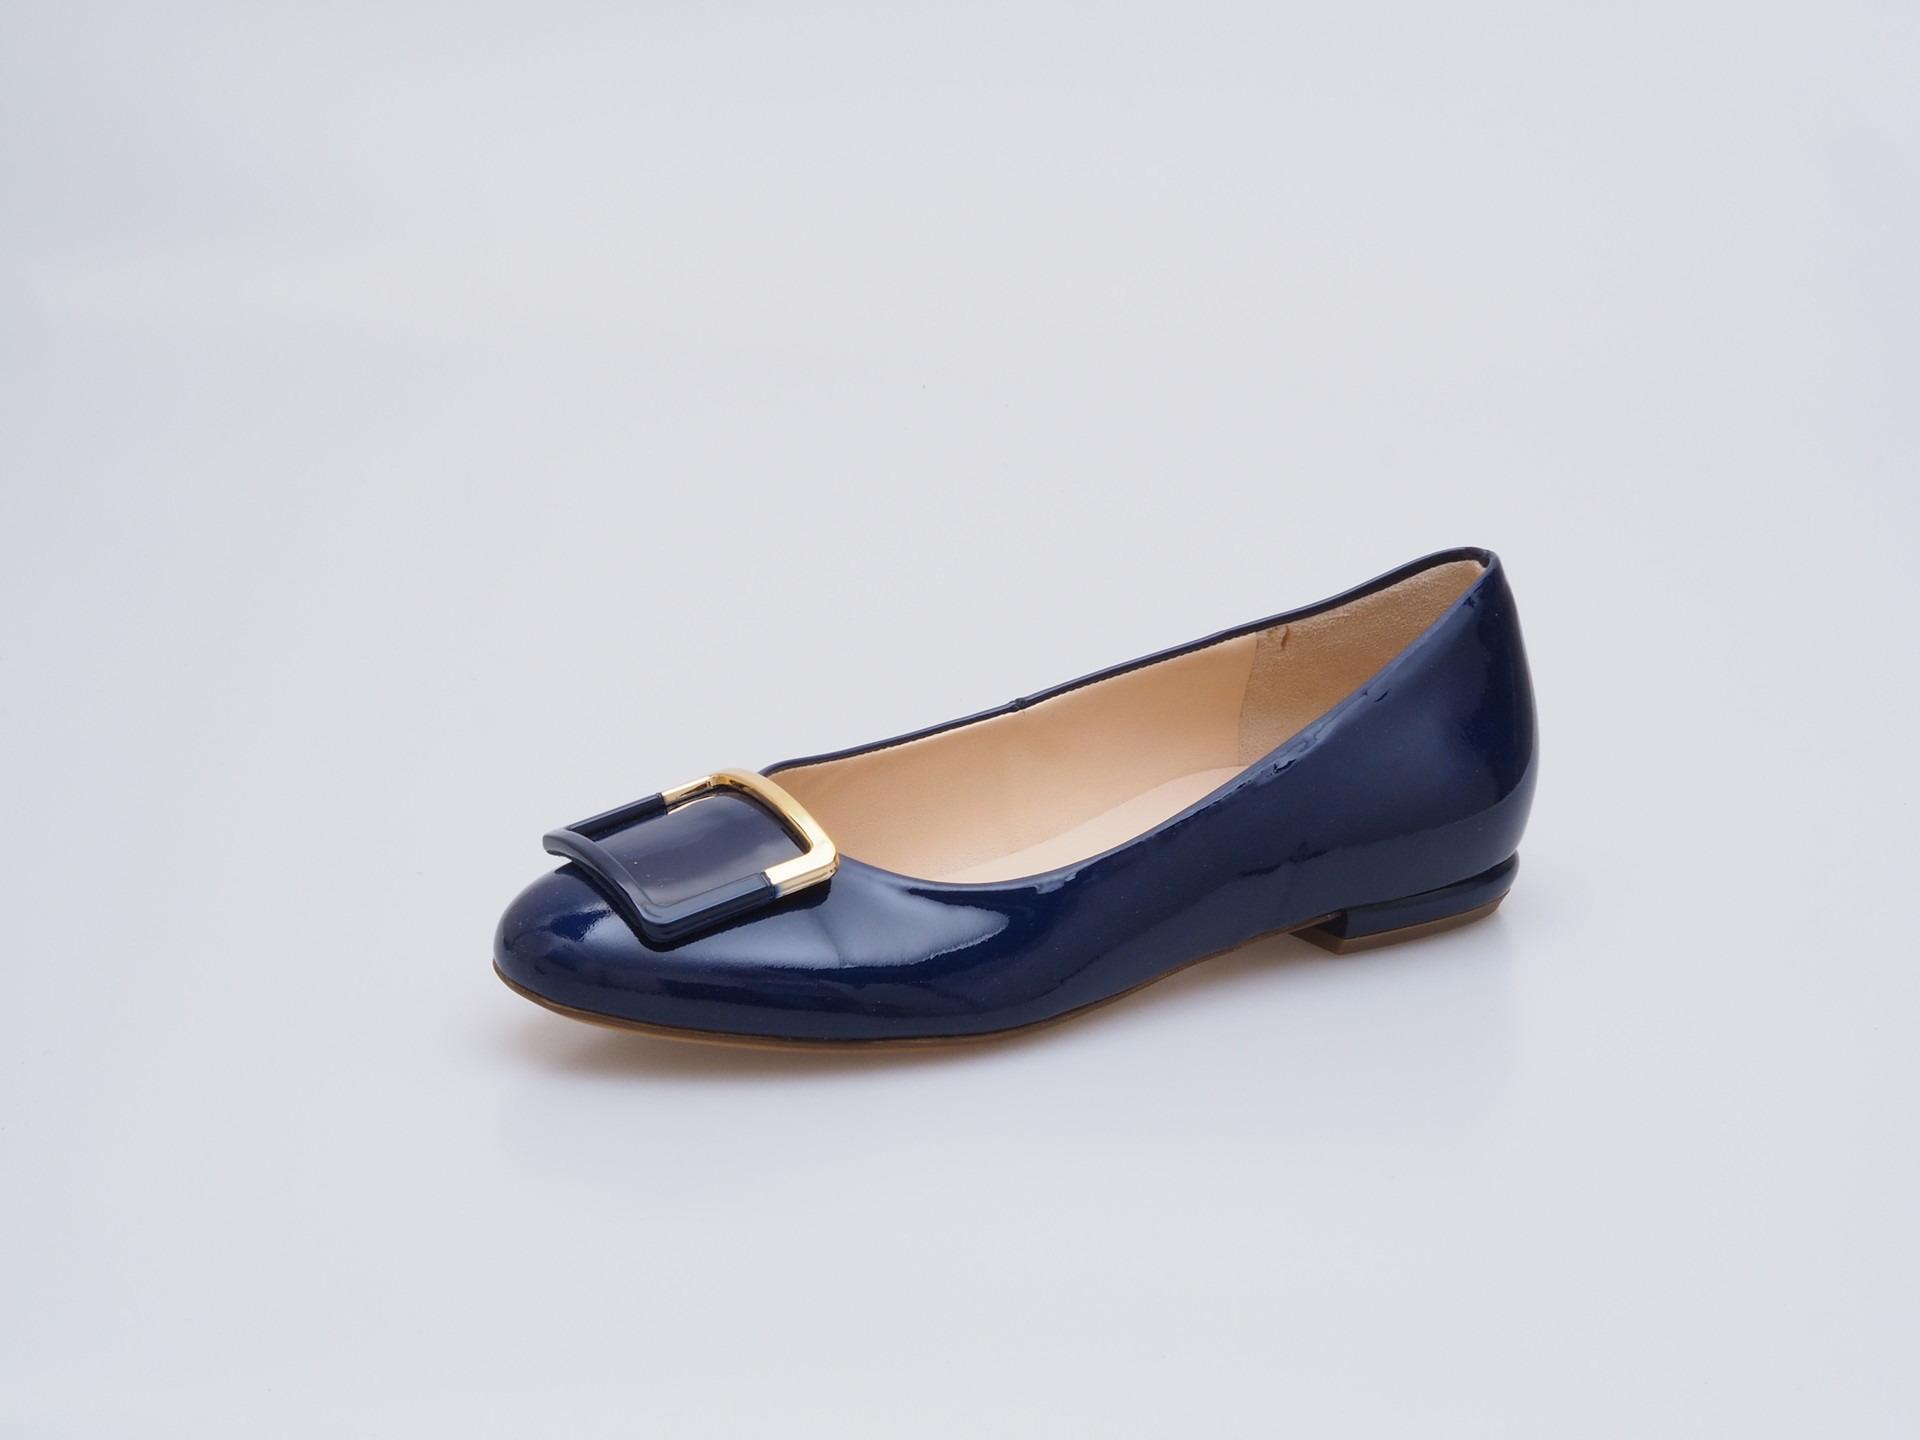 c303c821dda Soňa - Dámska obuv - Baleríny - Modré lakované baleríny Högl